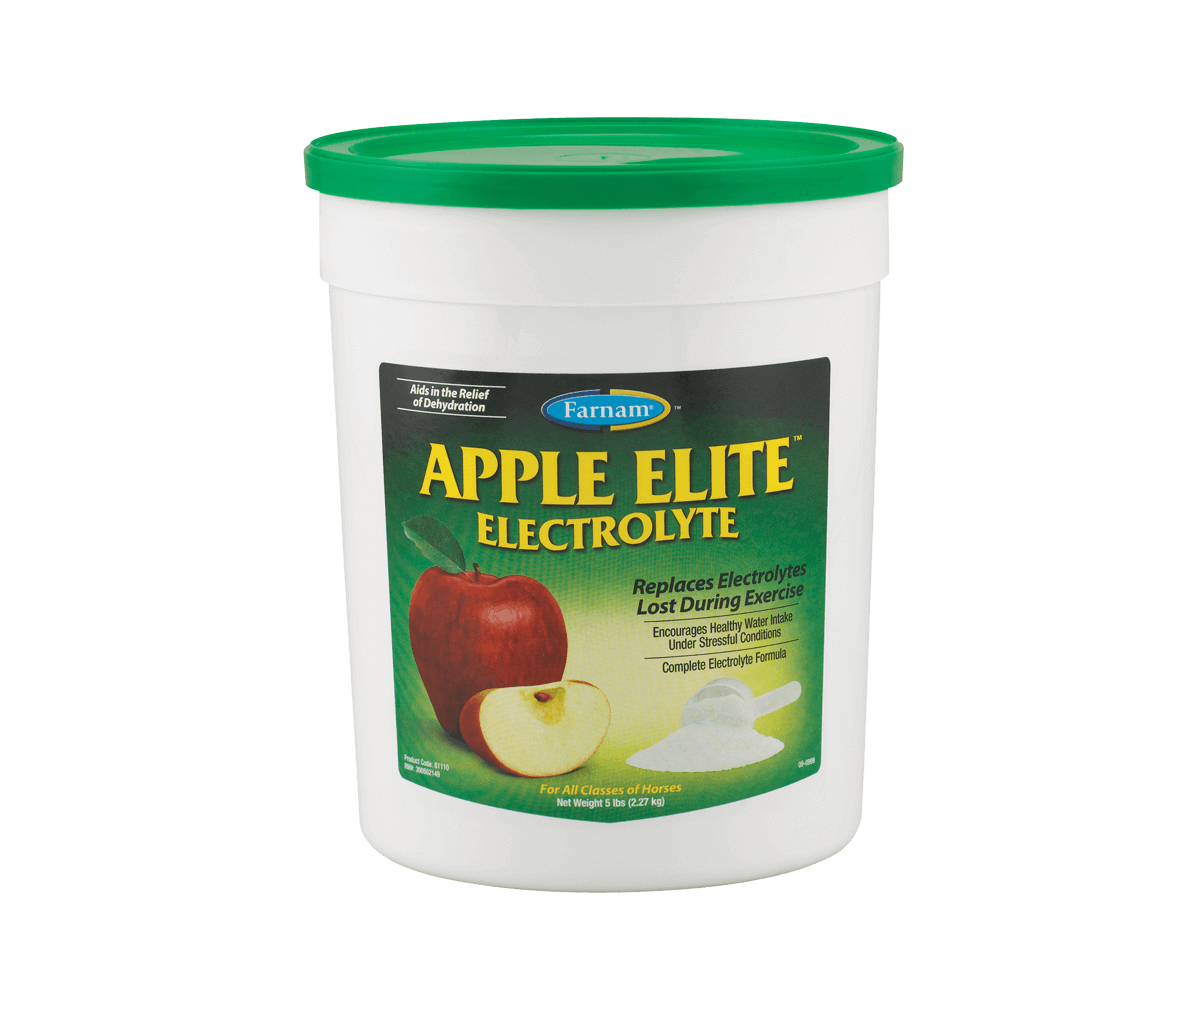 AppleElite-Electrolyte_5lb_81110_Product-Image